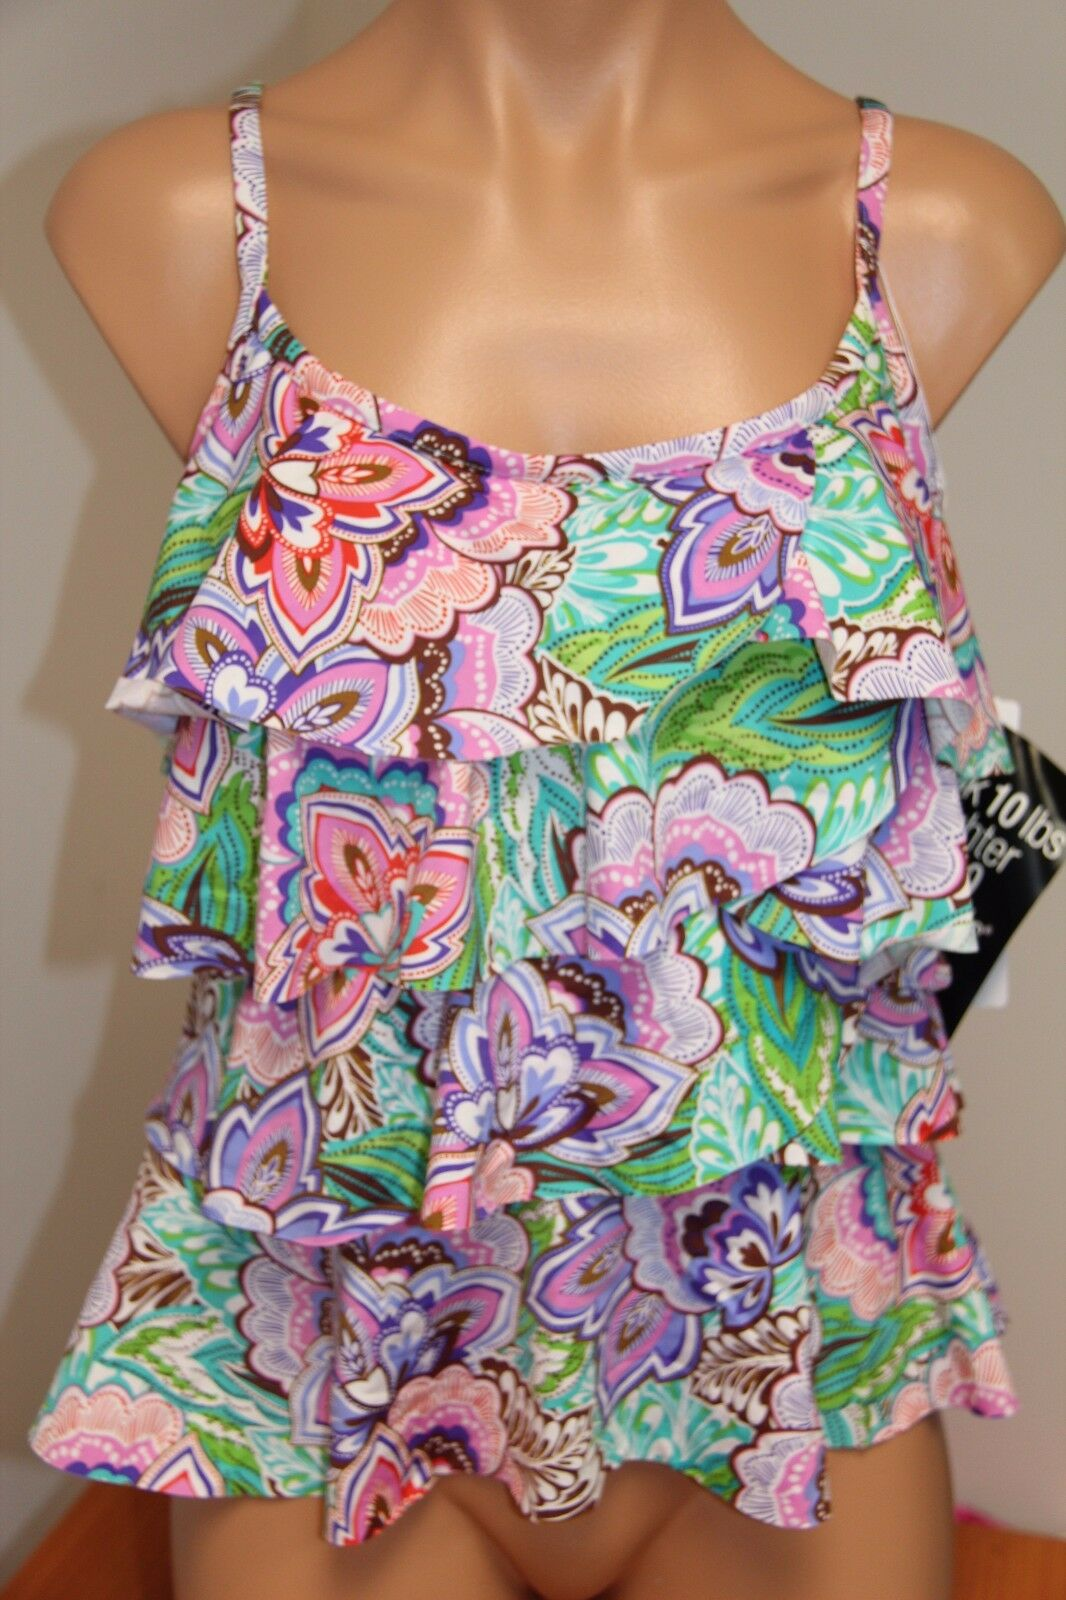 NWT  Miraclesuit Swimsuit Bikini Tankini Top sz 8 Pink Tiering UP Ruffles